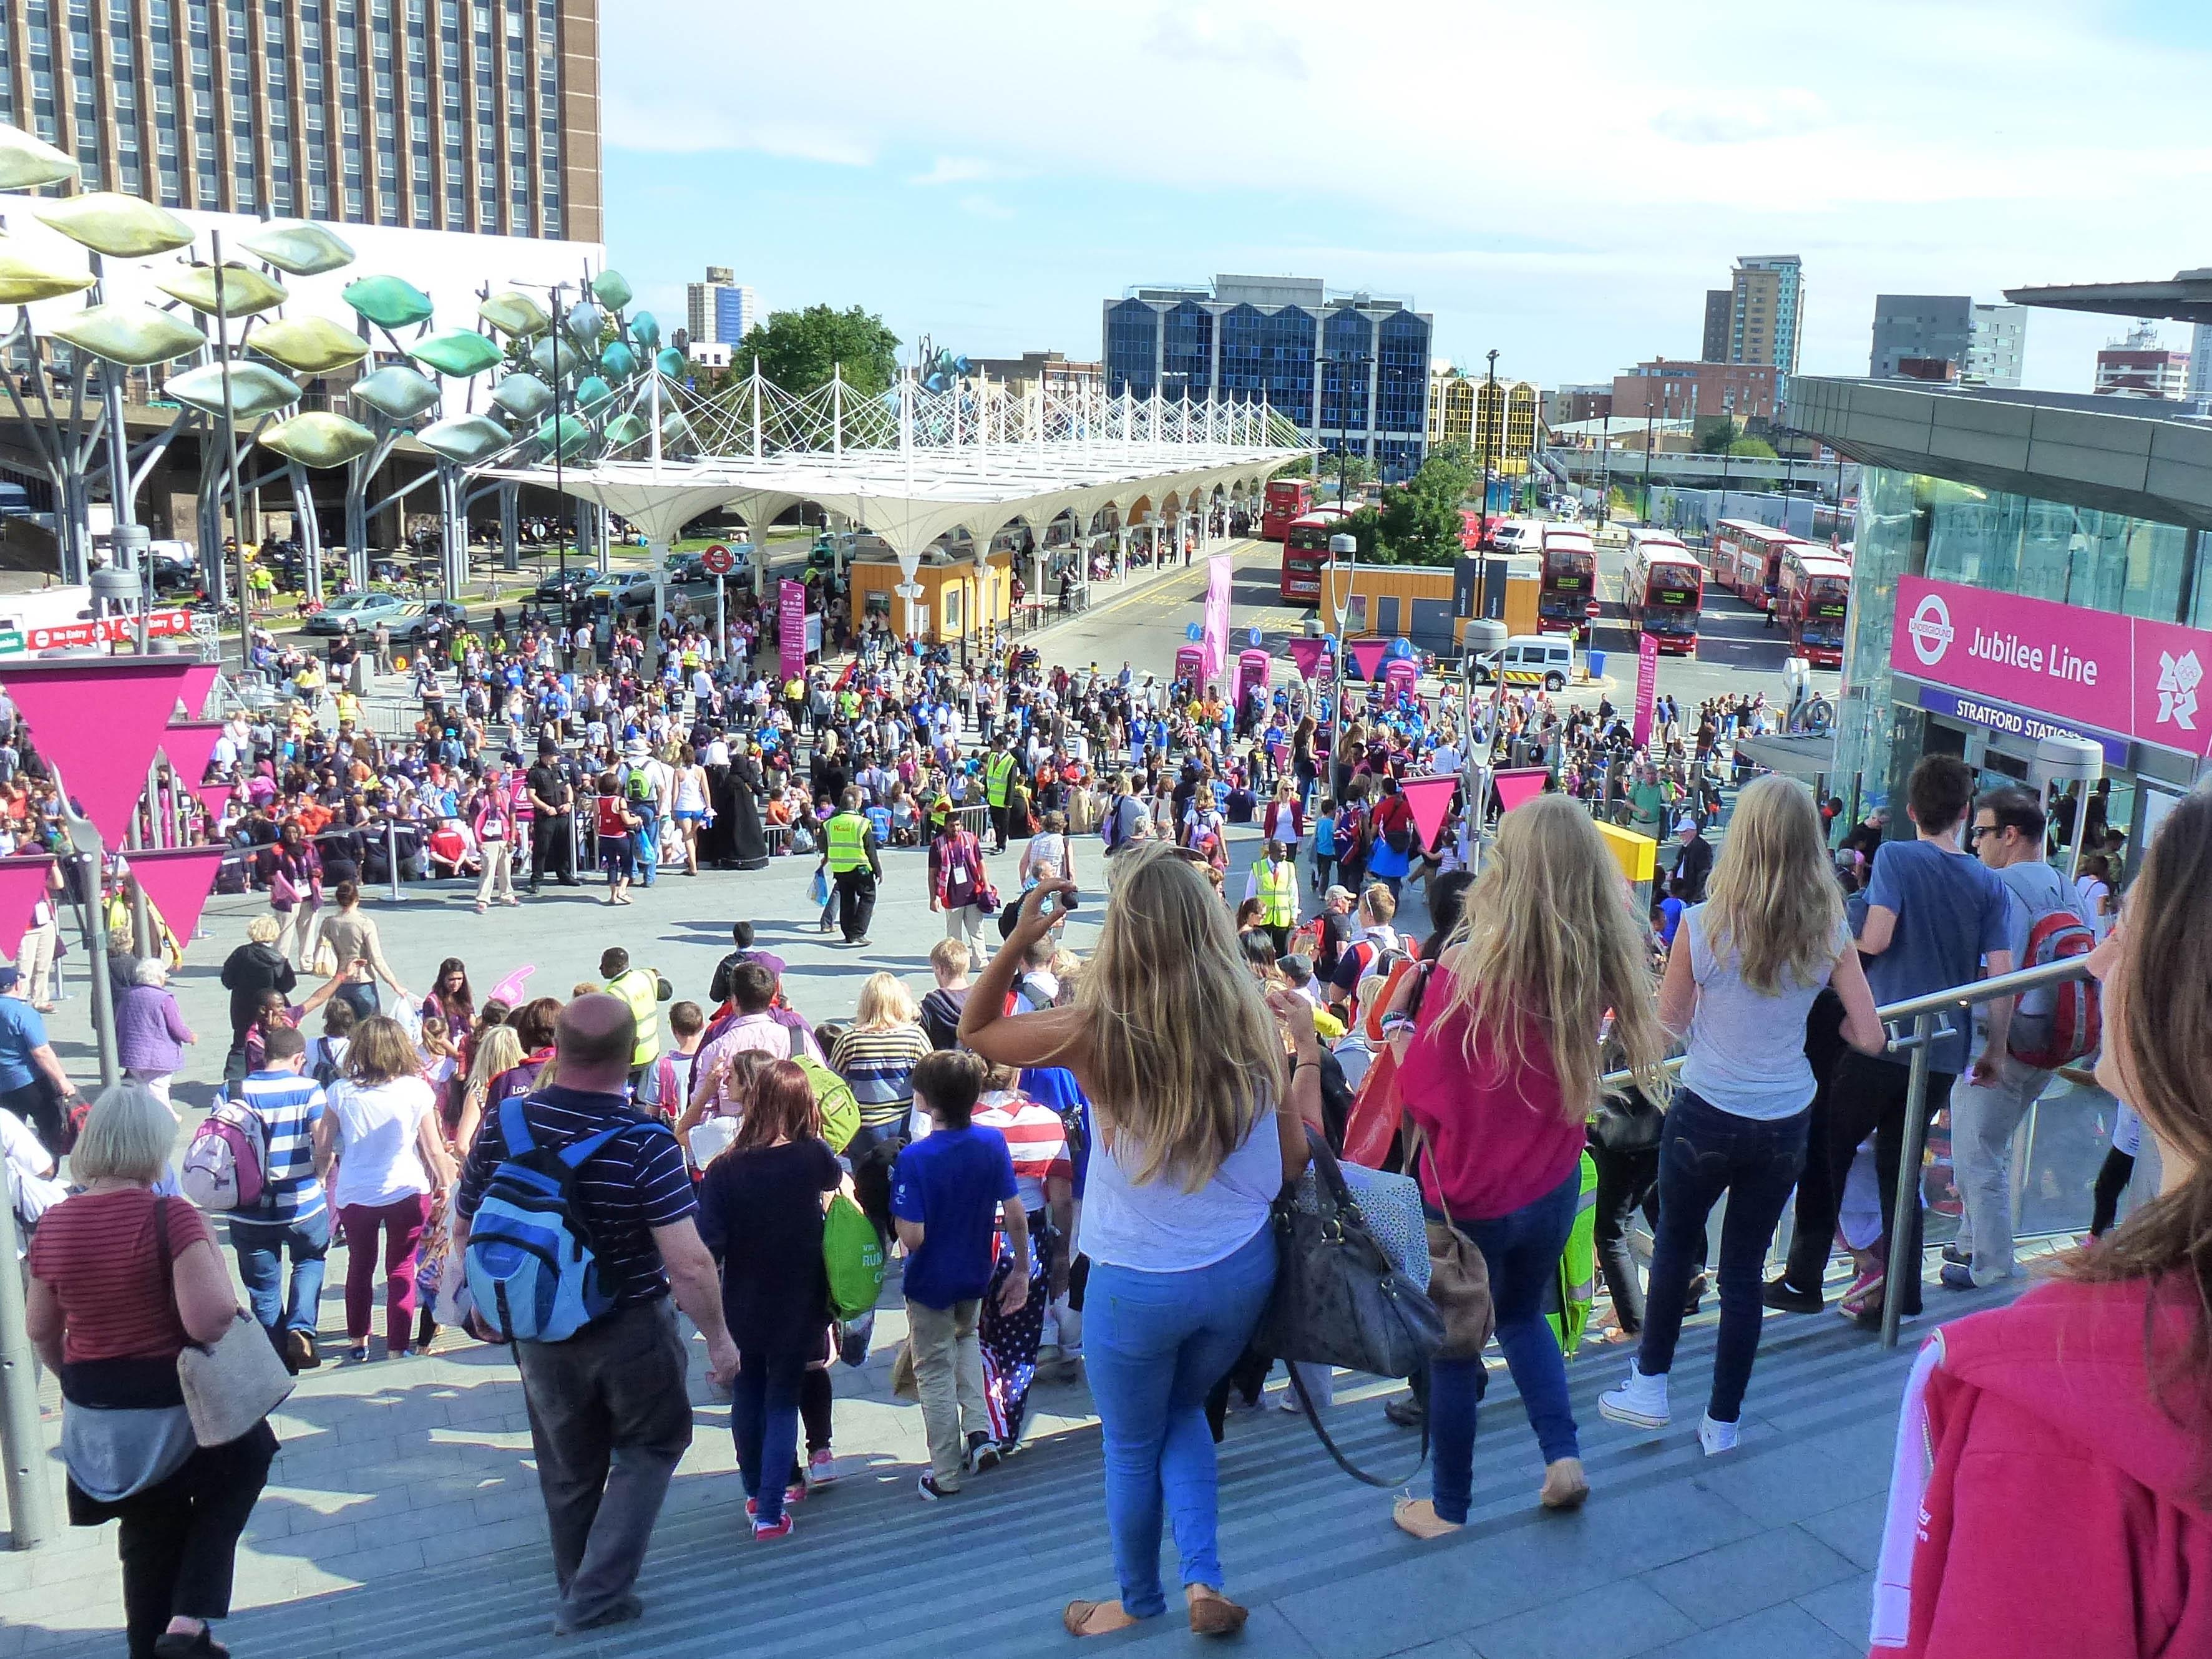 Crowd movement towards Stratford Station